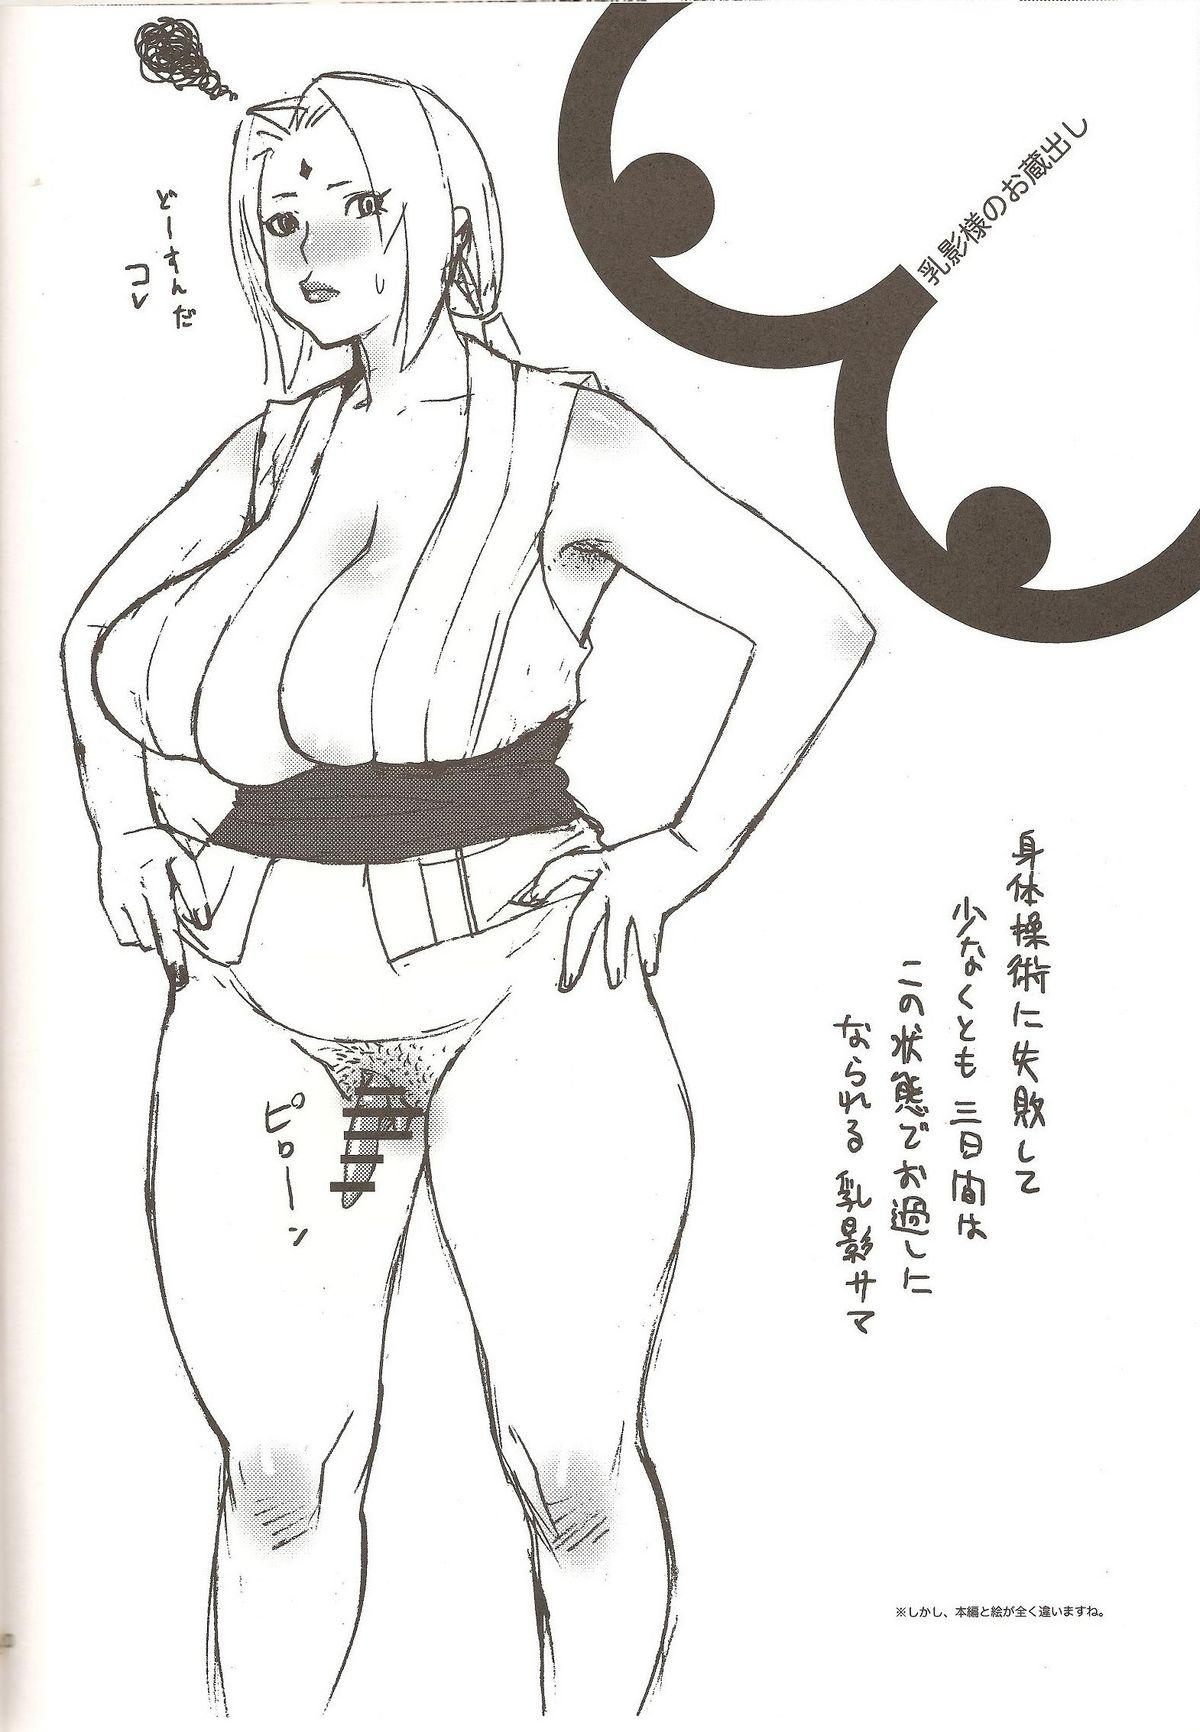 AbRAdEli kAMiTAbA No. 01 Chichikage Hanjouki 18